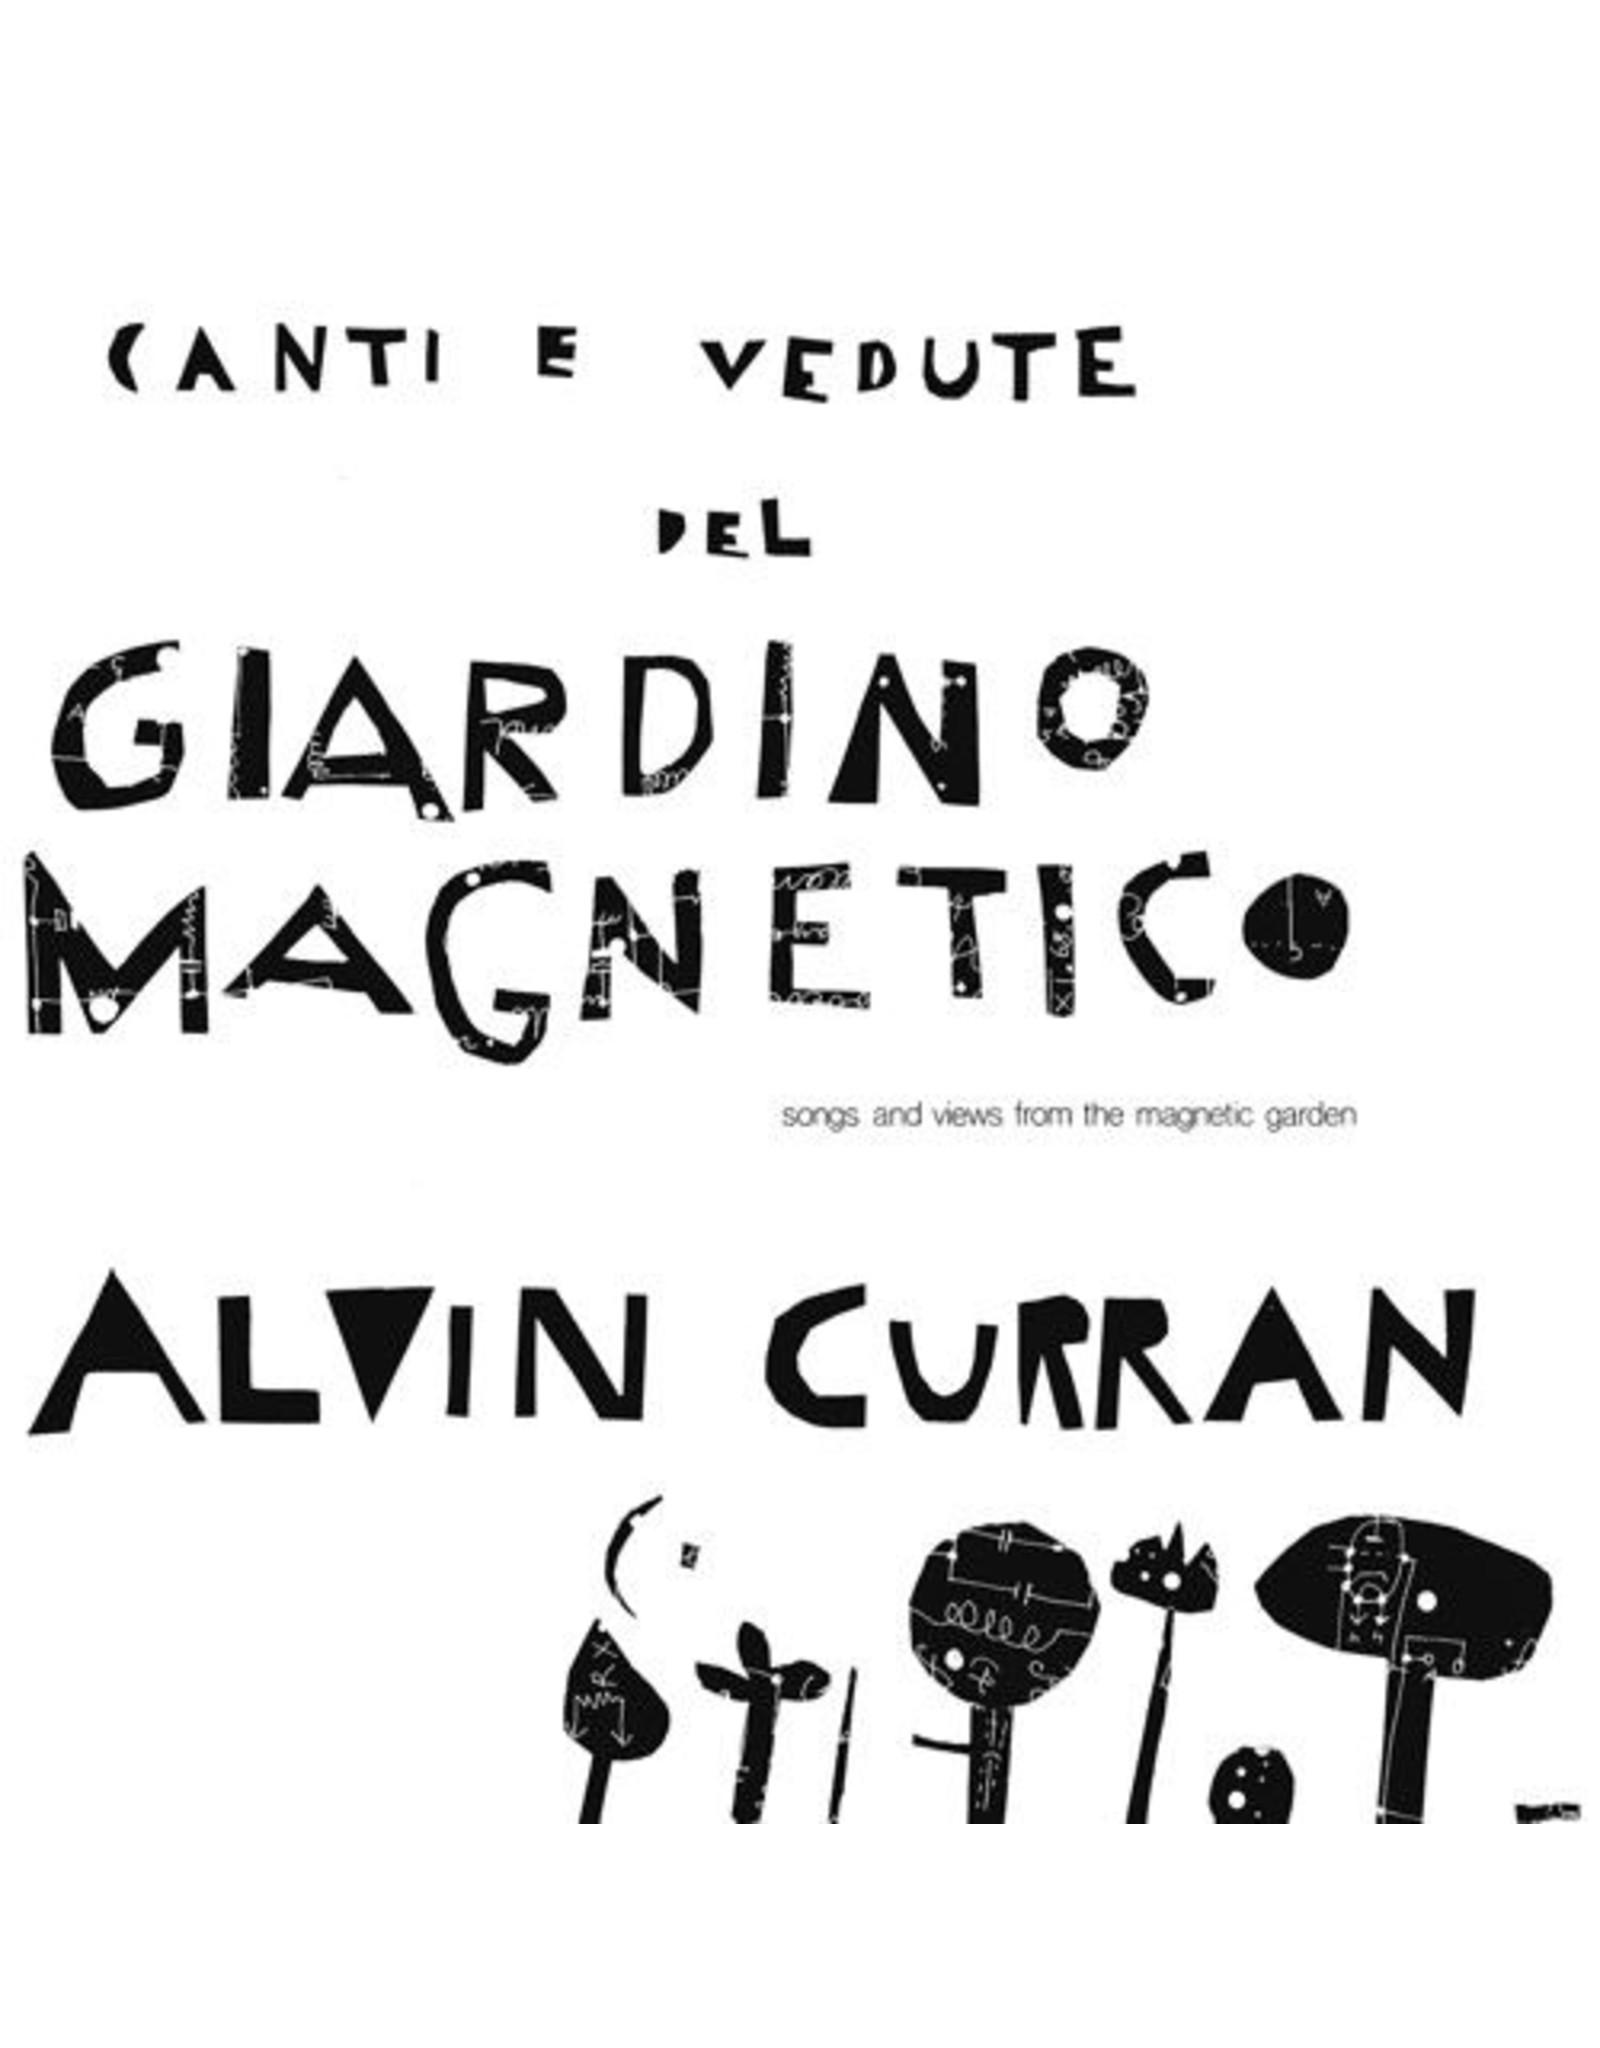 Superior Viaduct Curran, Alvin: Canti E Vedute Del LP